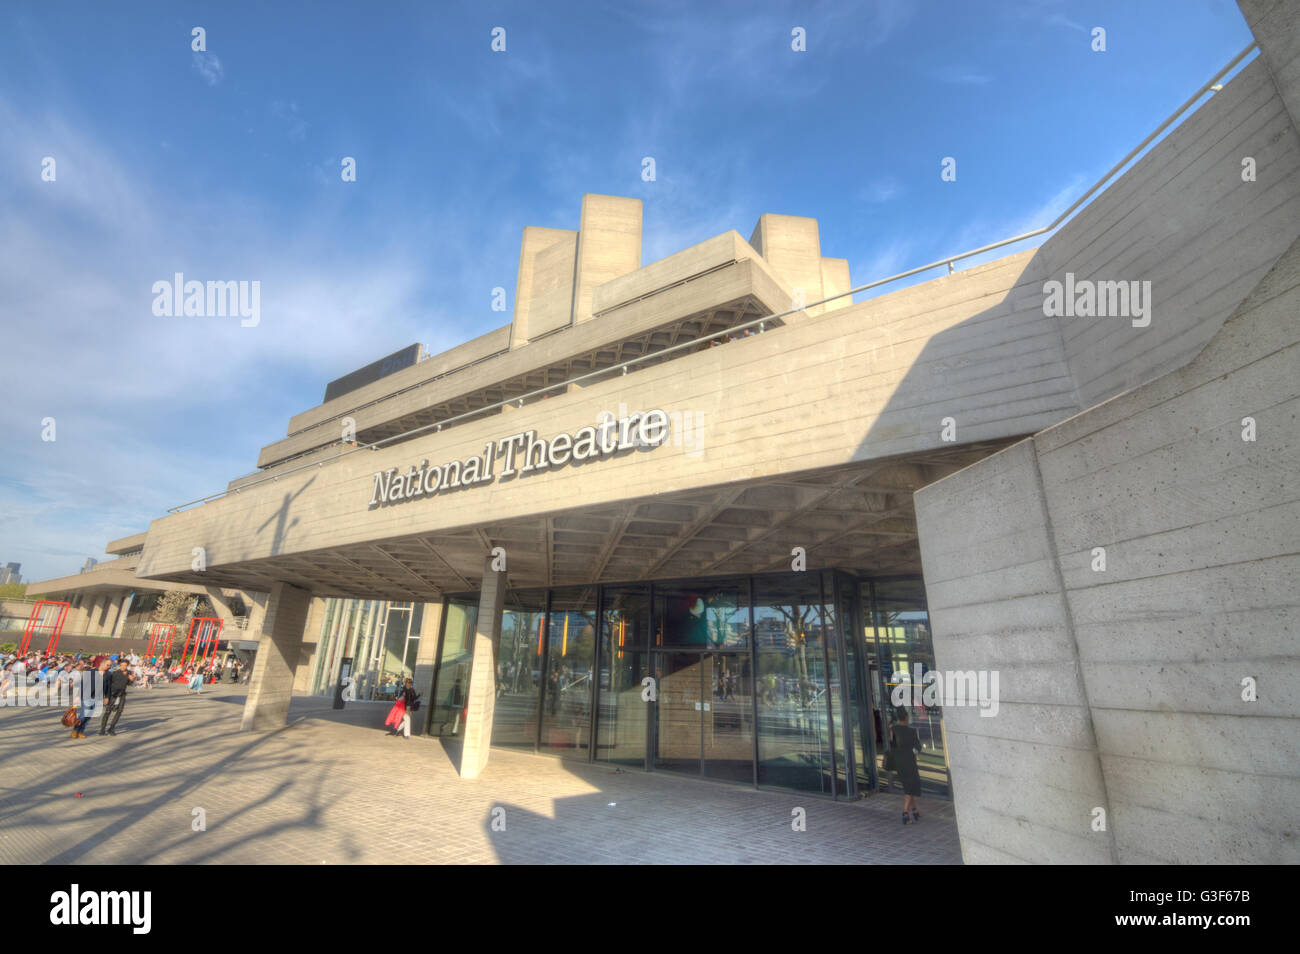 National Theatre, London.   Brutalist. Modernist architecture - Stock Image